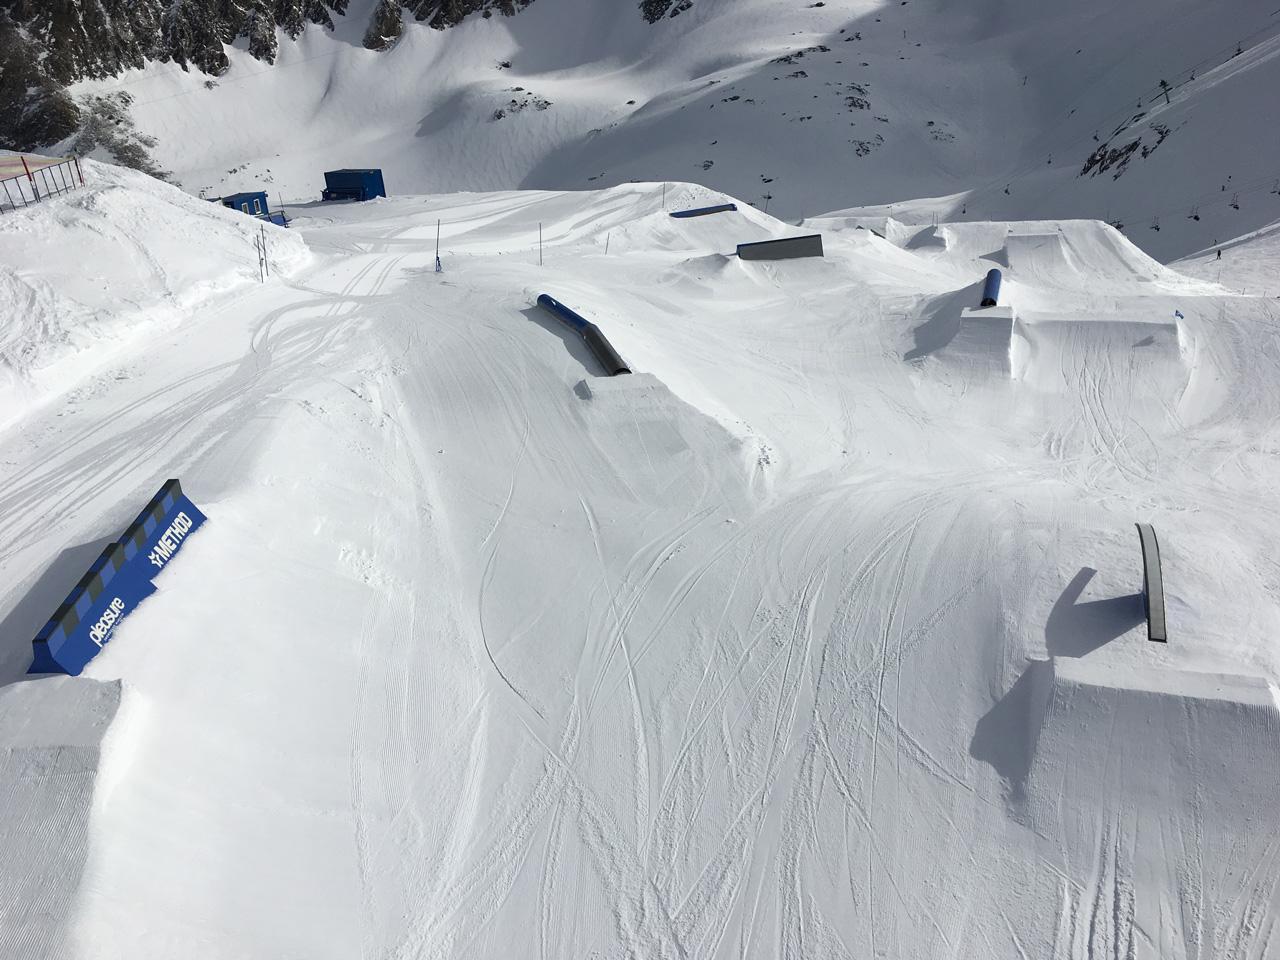 Prime-Snowboarding-Kitzsteinhorn-Update-01